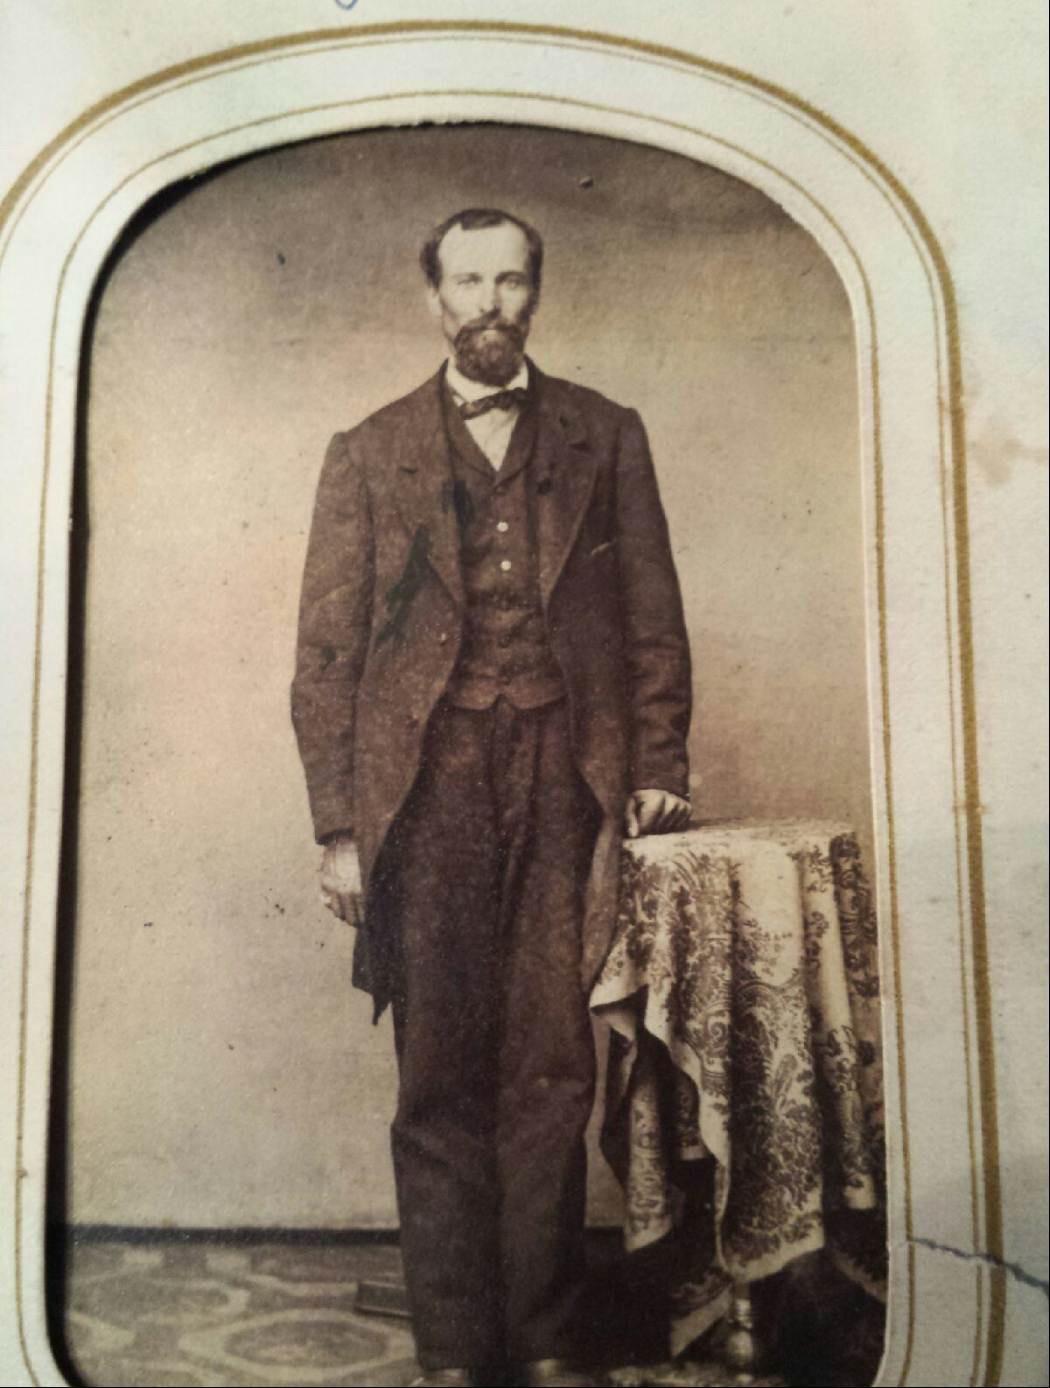 Edward Lewis Fazenbaker